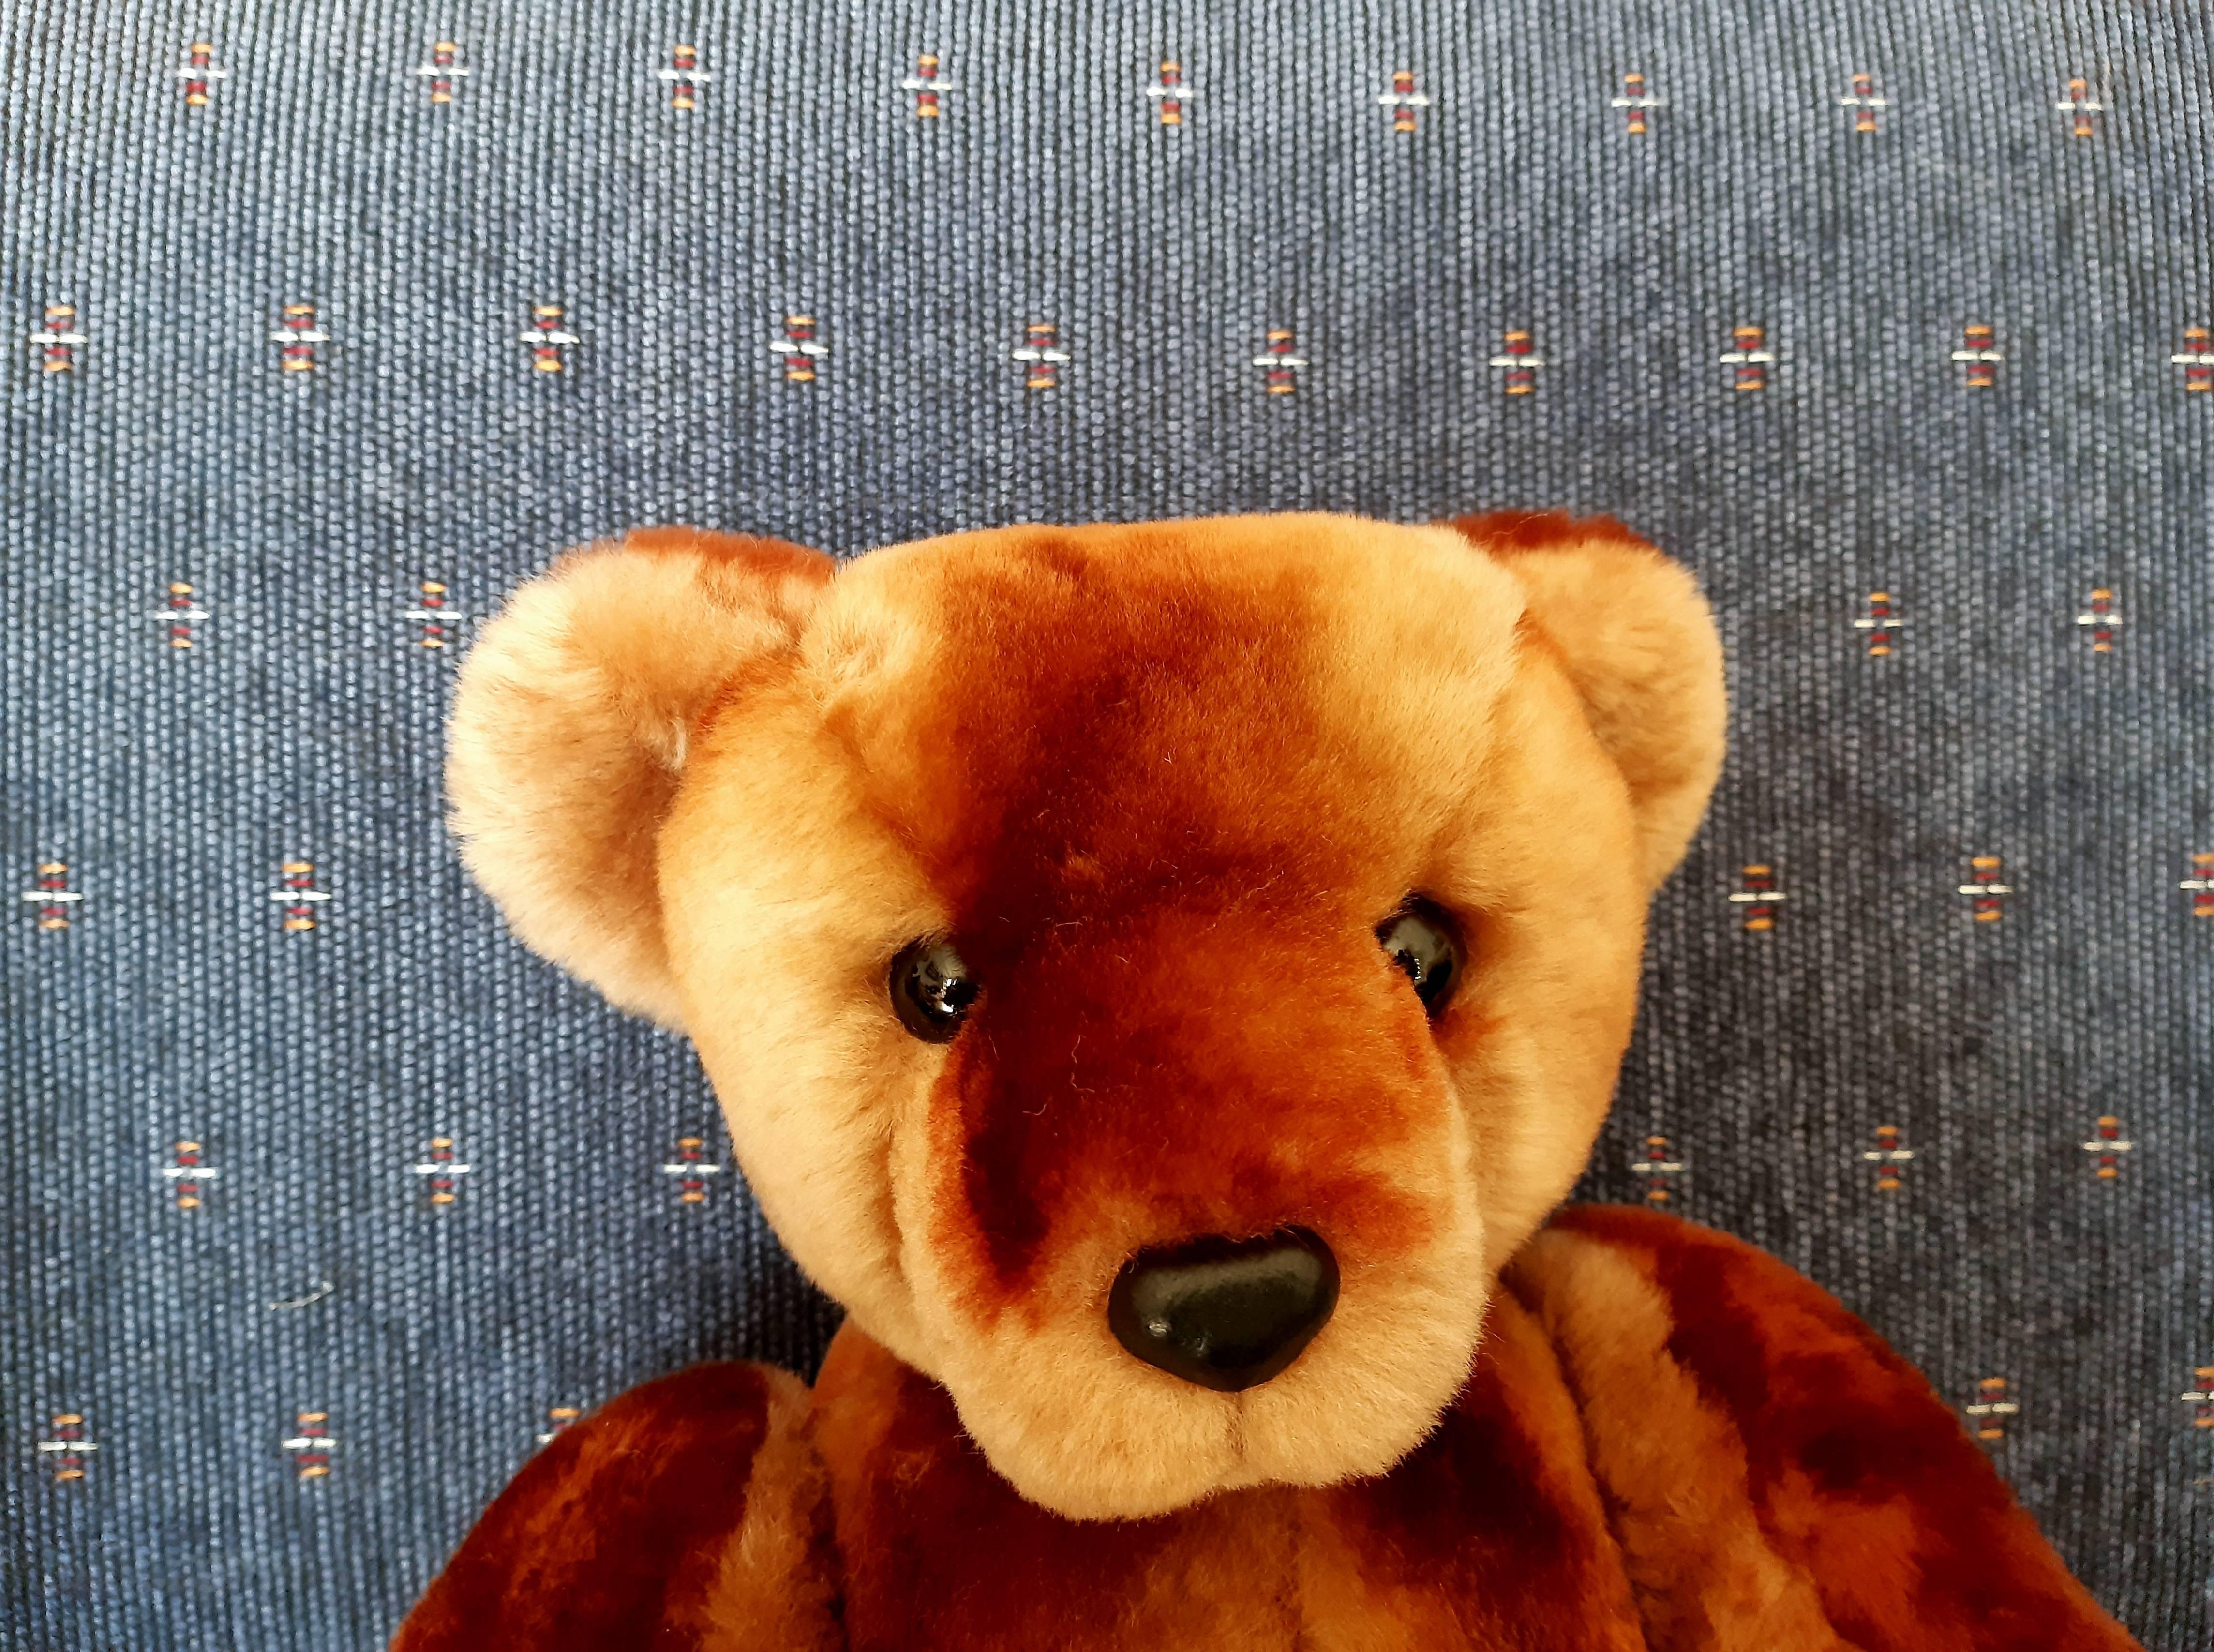 Sonny Bear